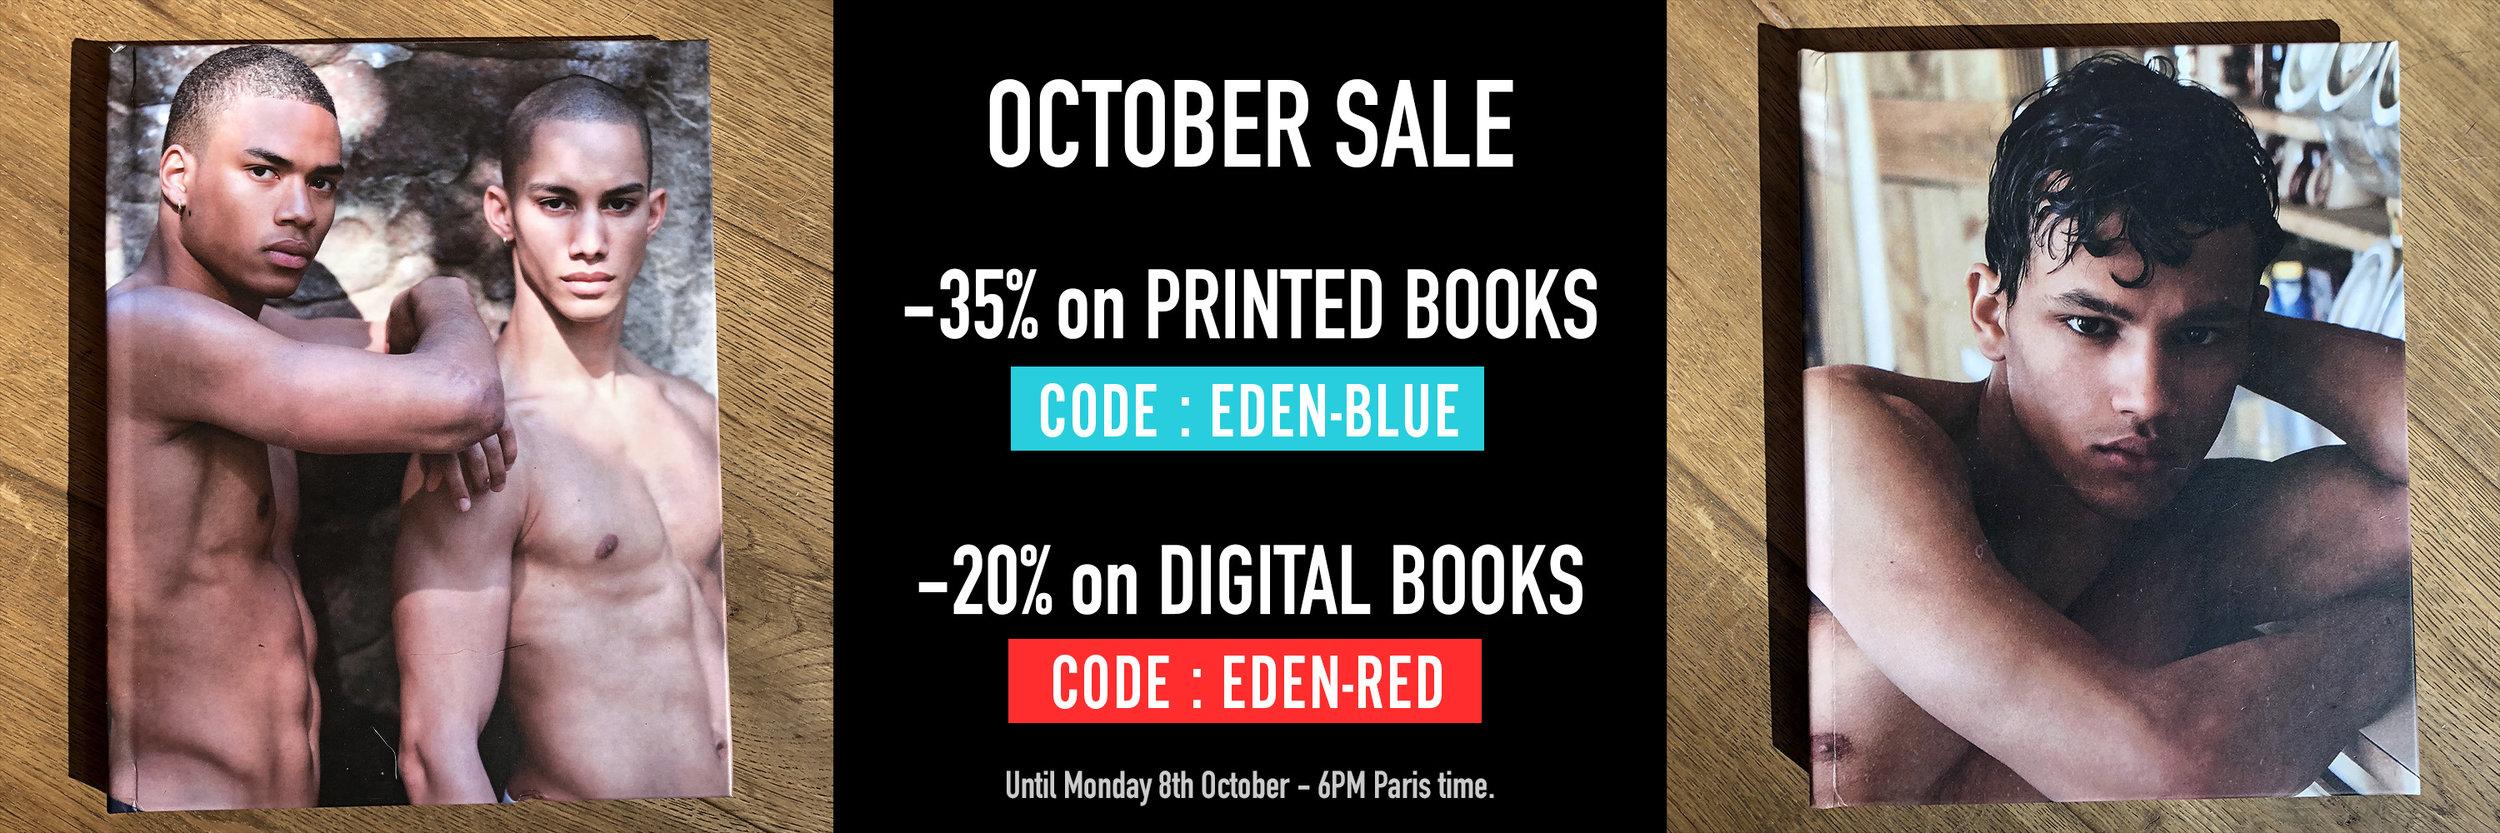 October-Sale.jpg